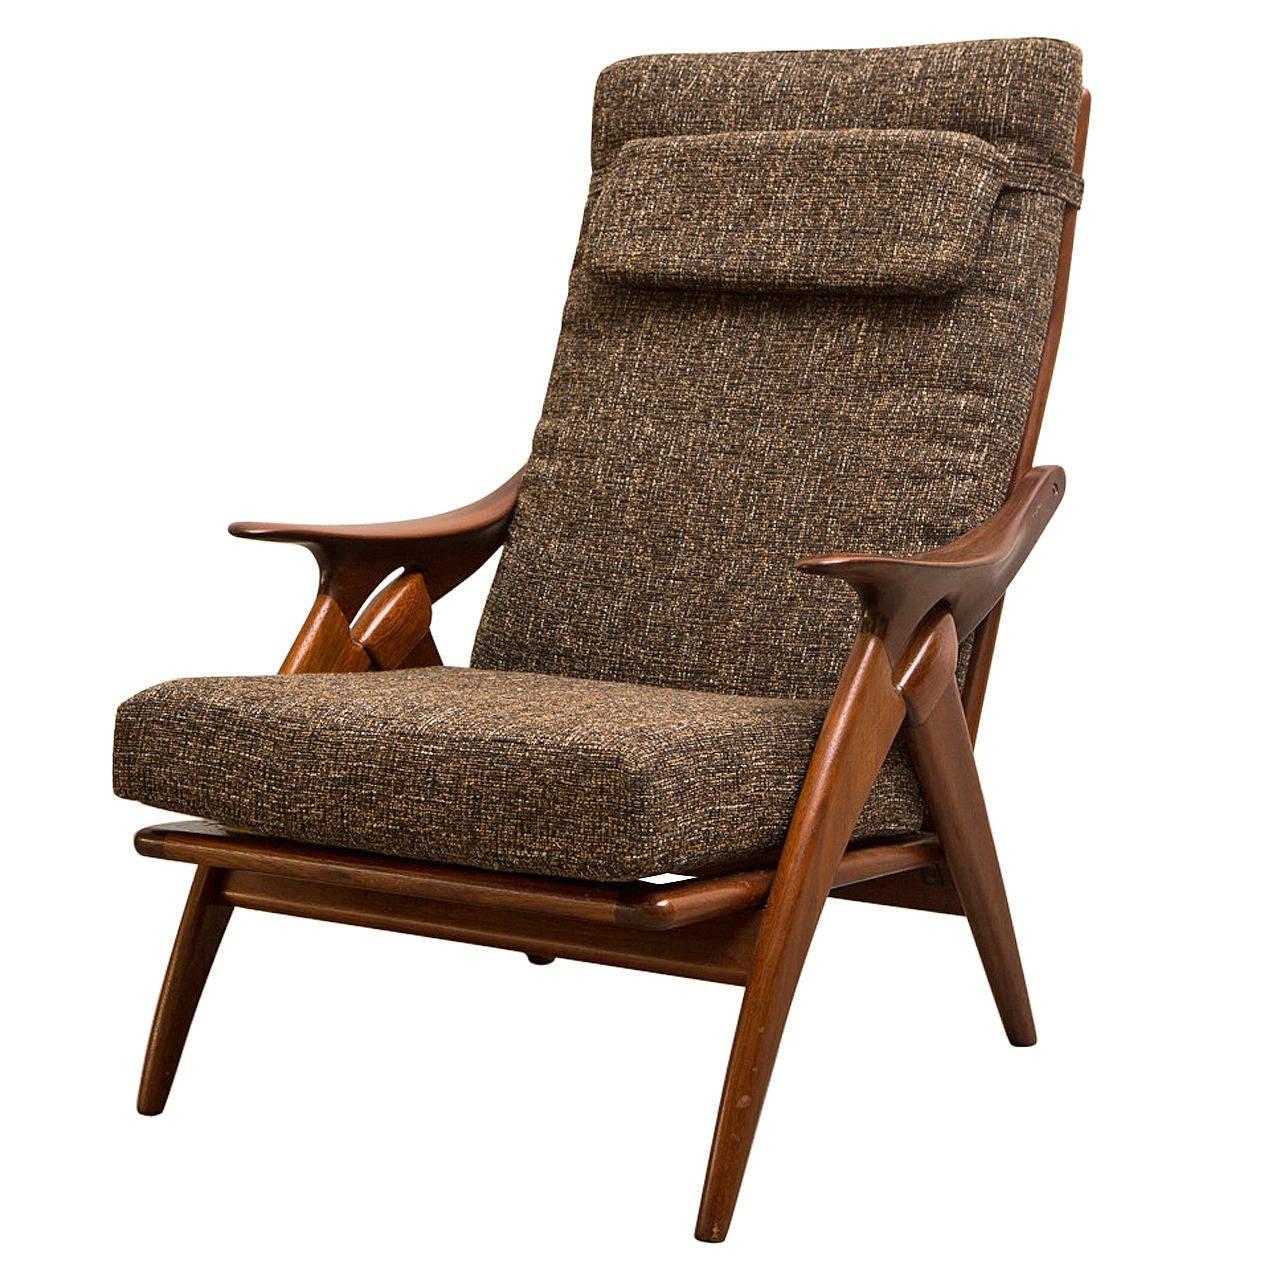 teak lounge chair folding beach with wheels de ster mid century at 1stdibs